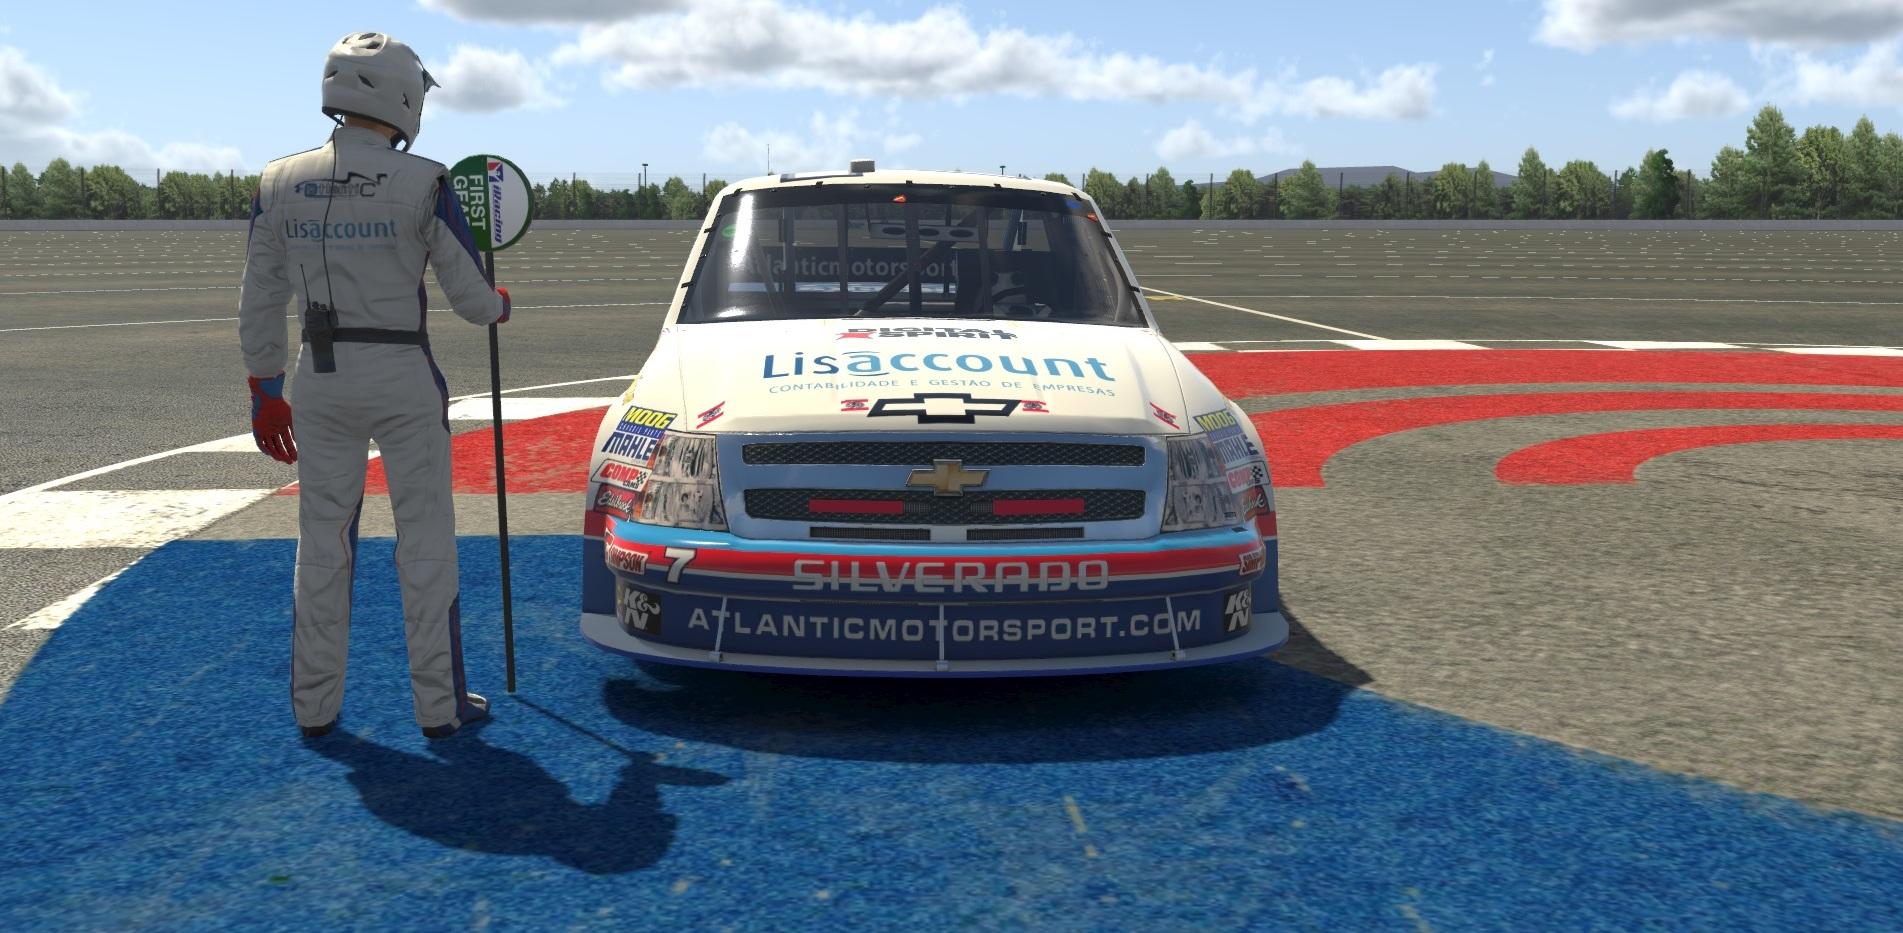 Atlantic Motorsport Academy presents the new Chevrolet Silverado Truck for iRacing